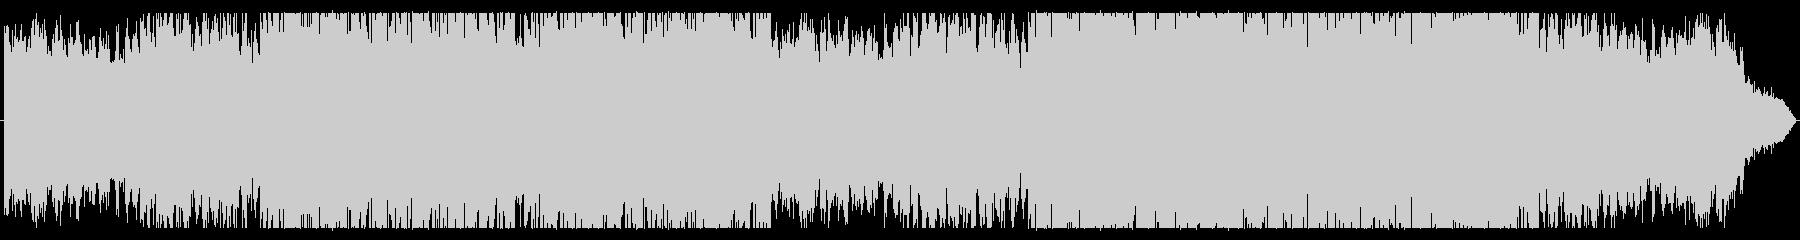 lofiでChillなBGMです。  の未再生の波形